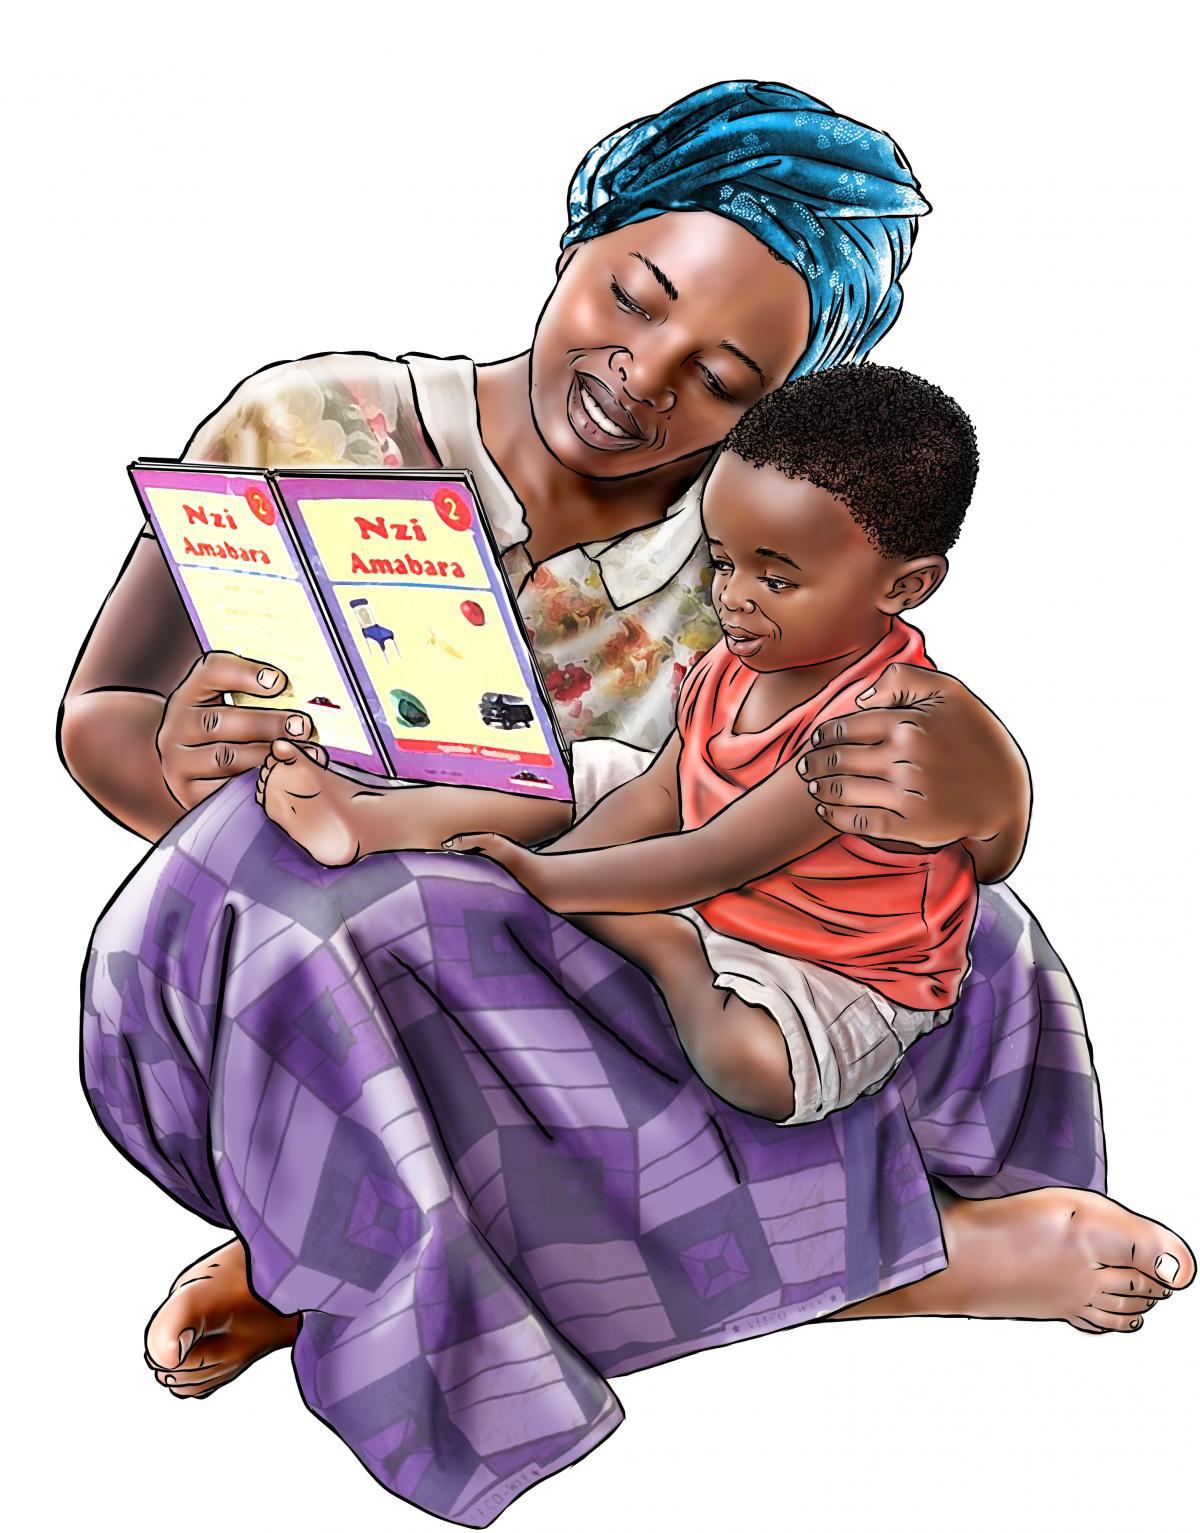 Early Communication - Mother reading with child - 01 - Rwanda